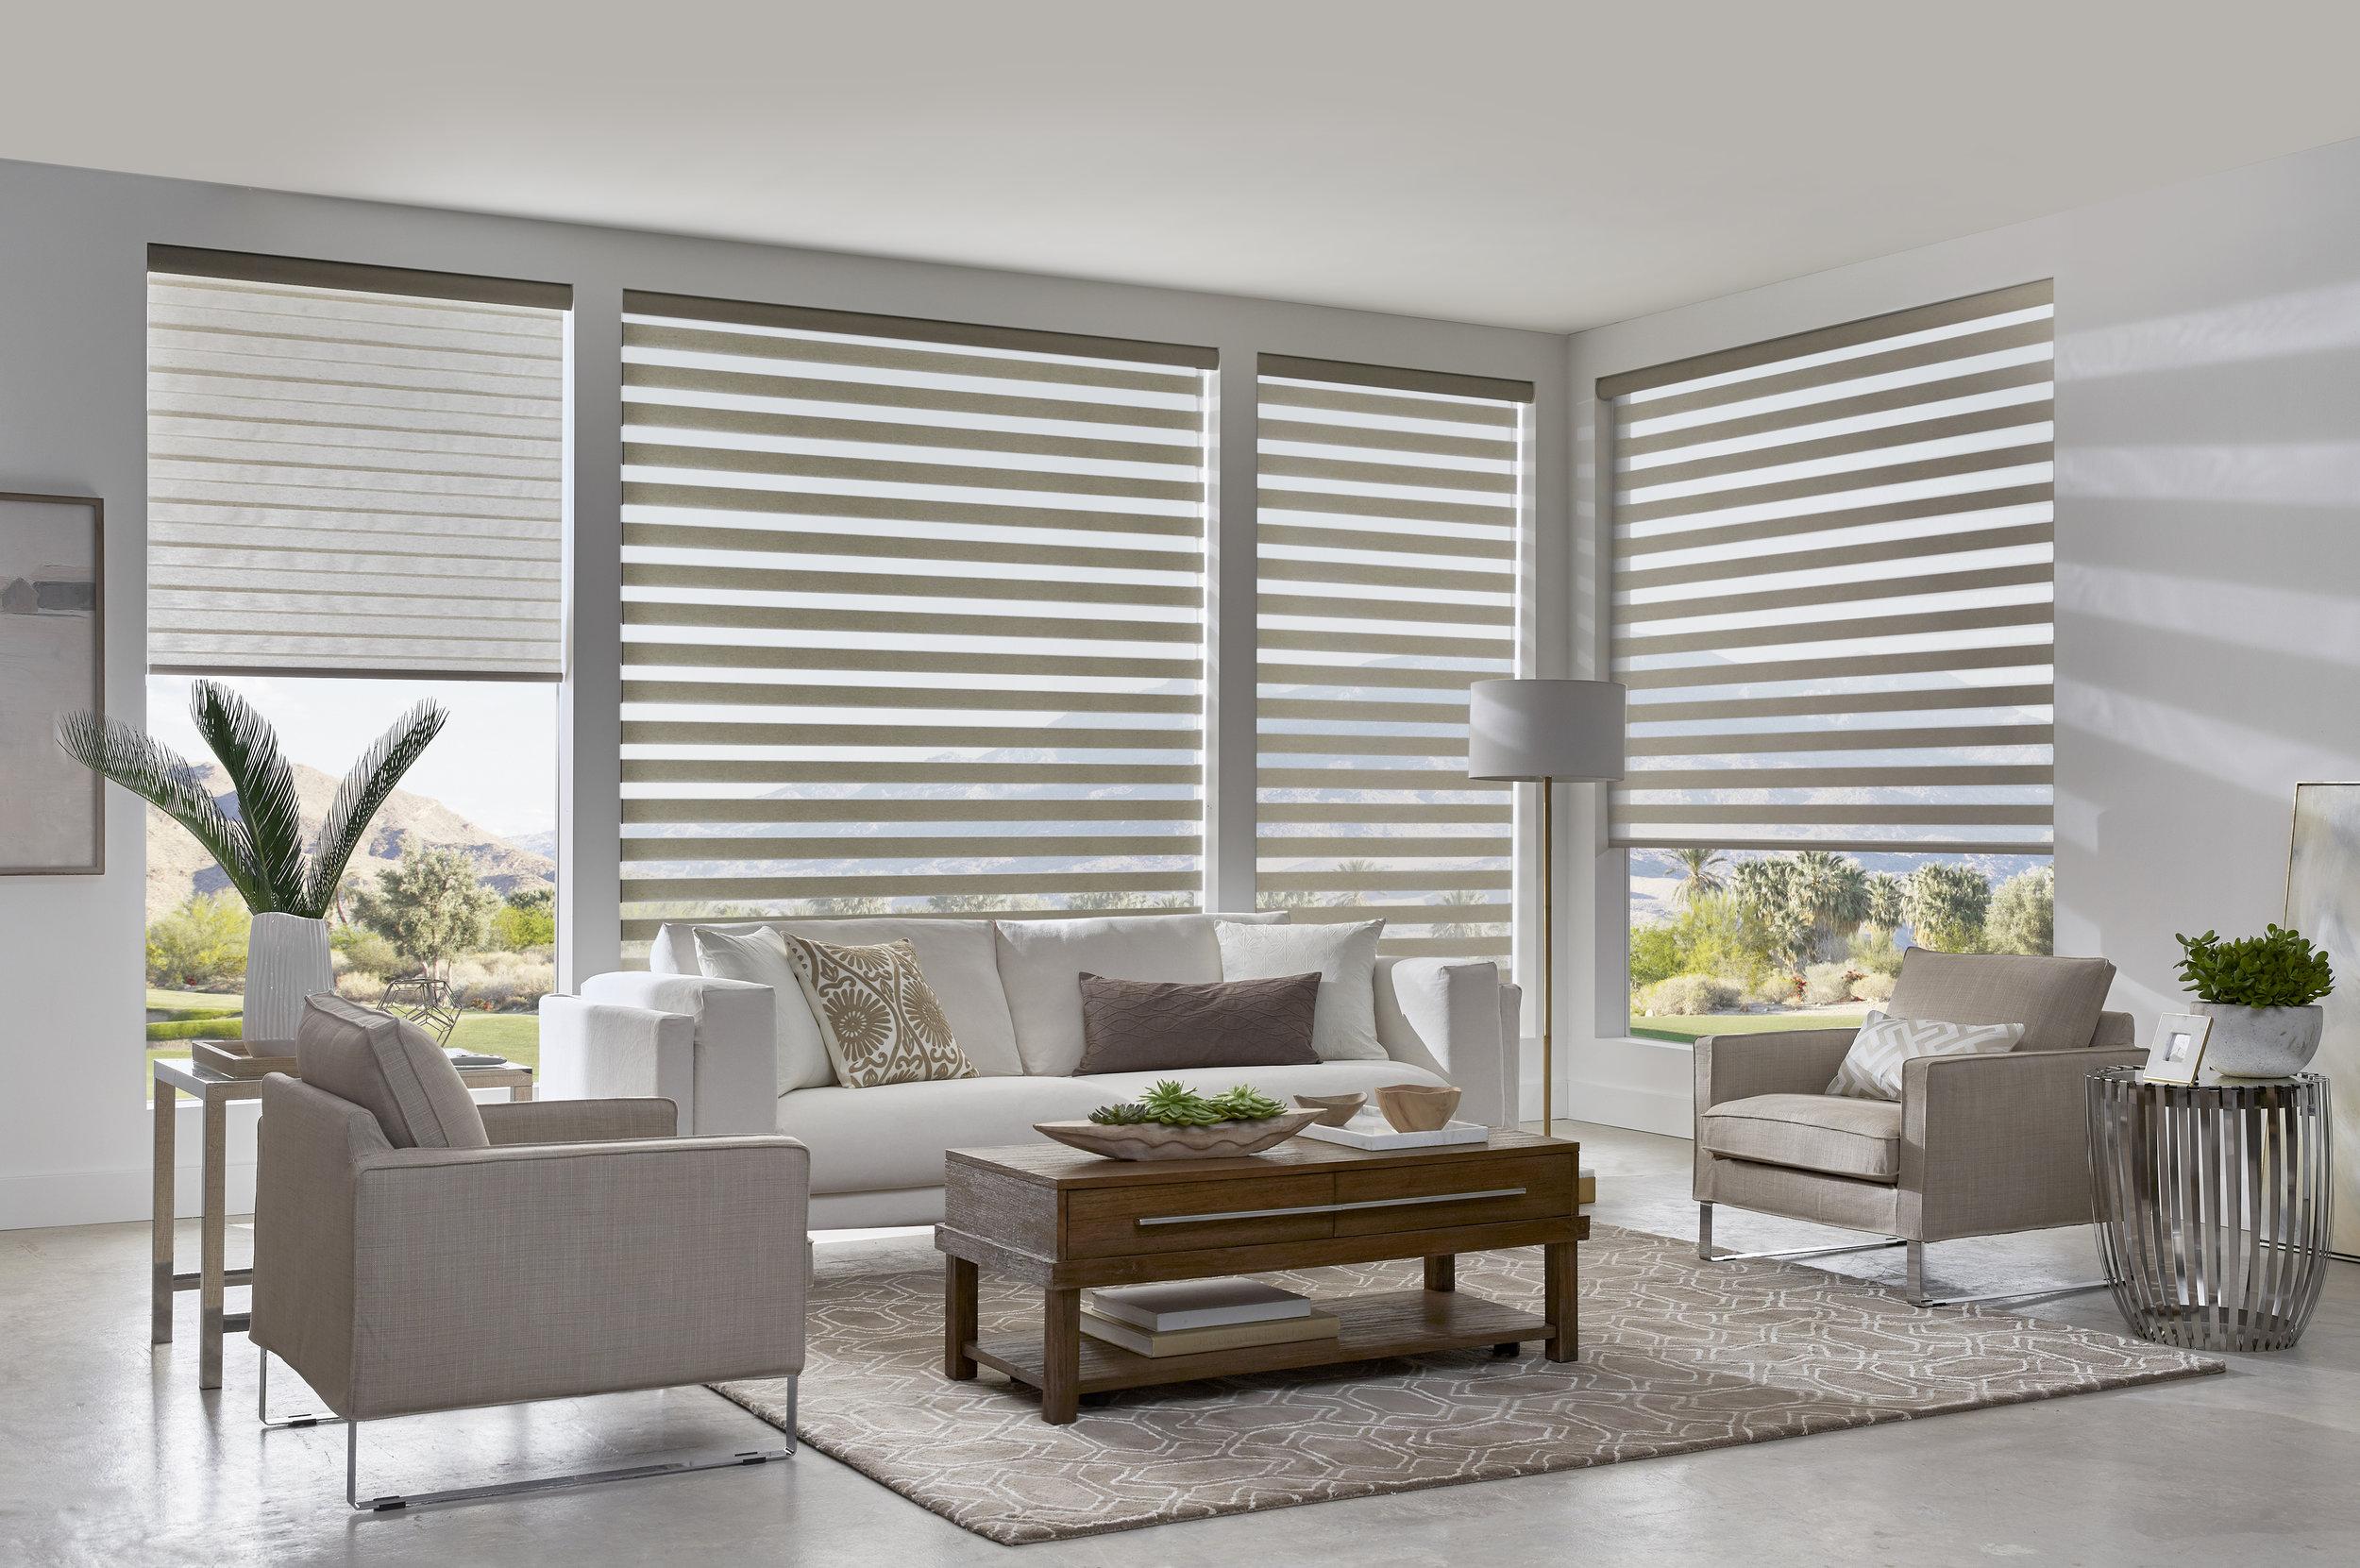 Custom Window Shades and Blinds